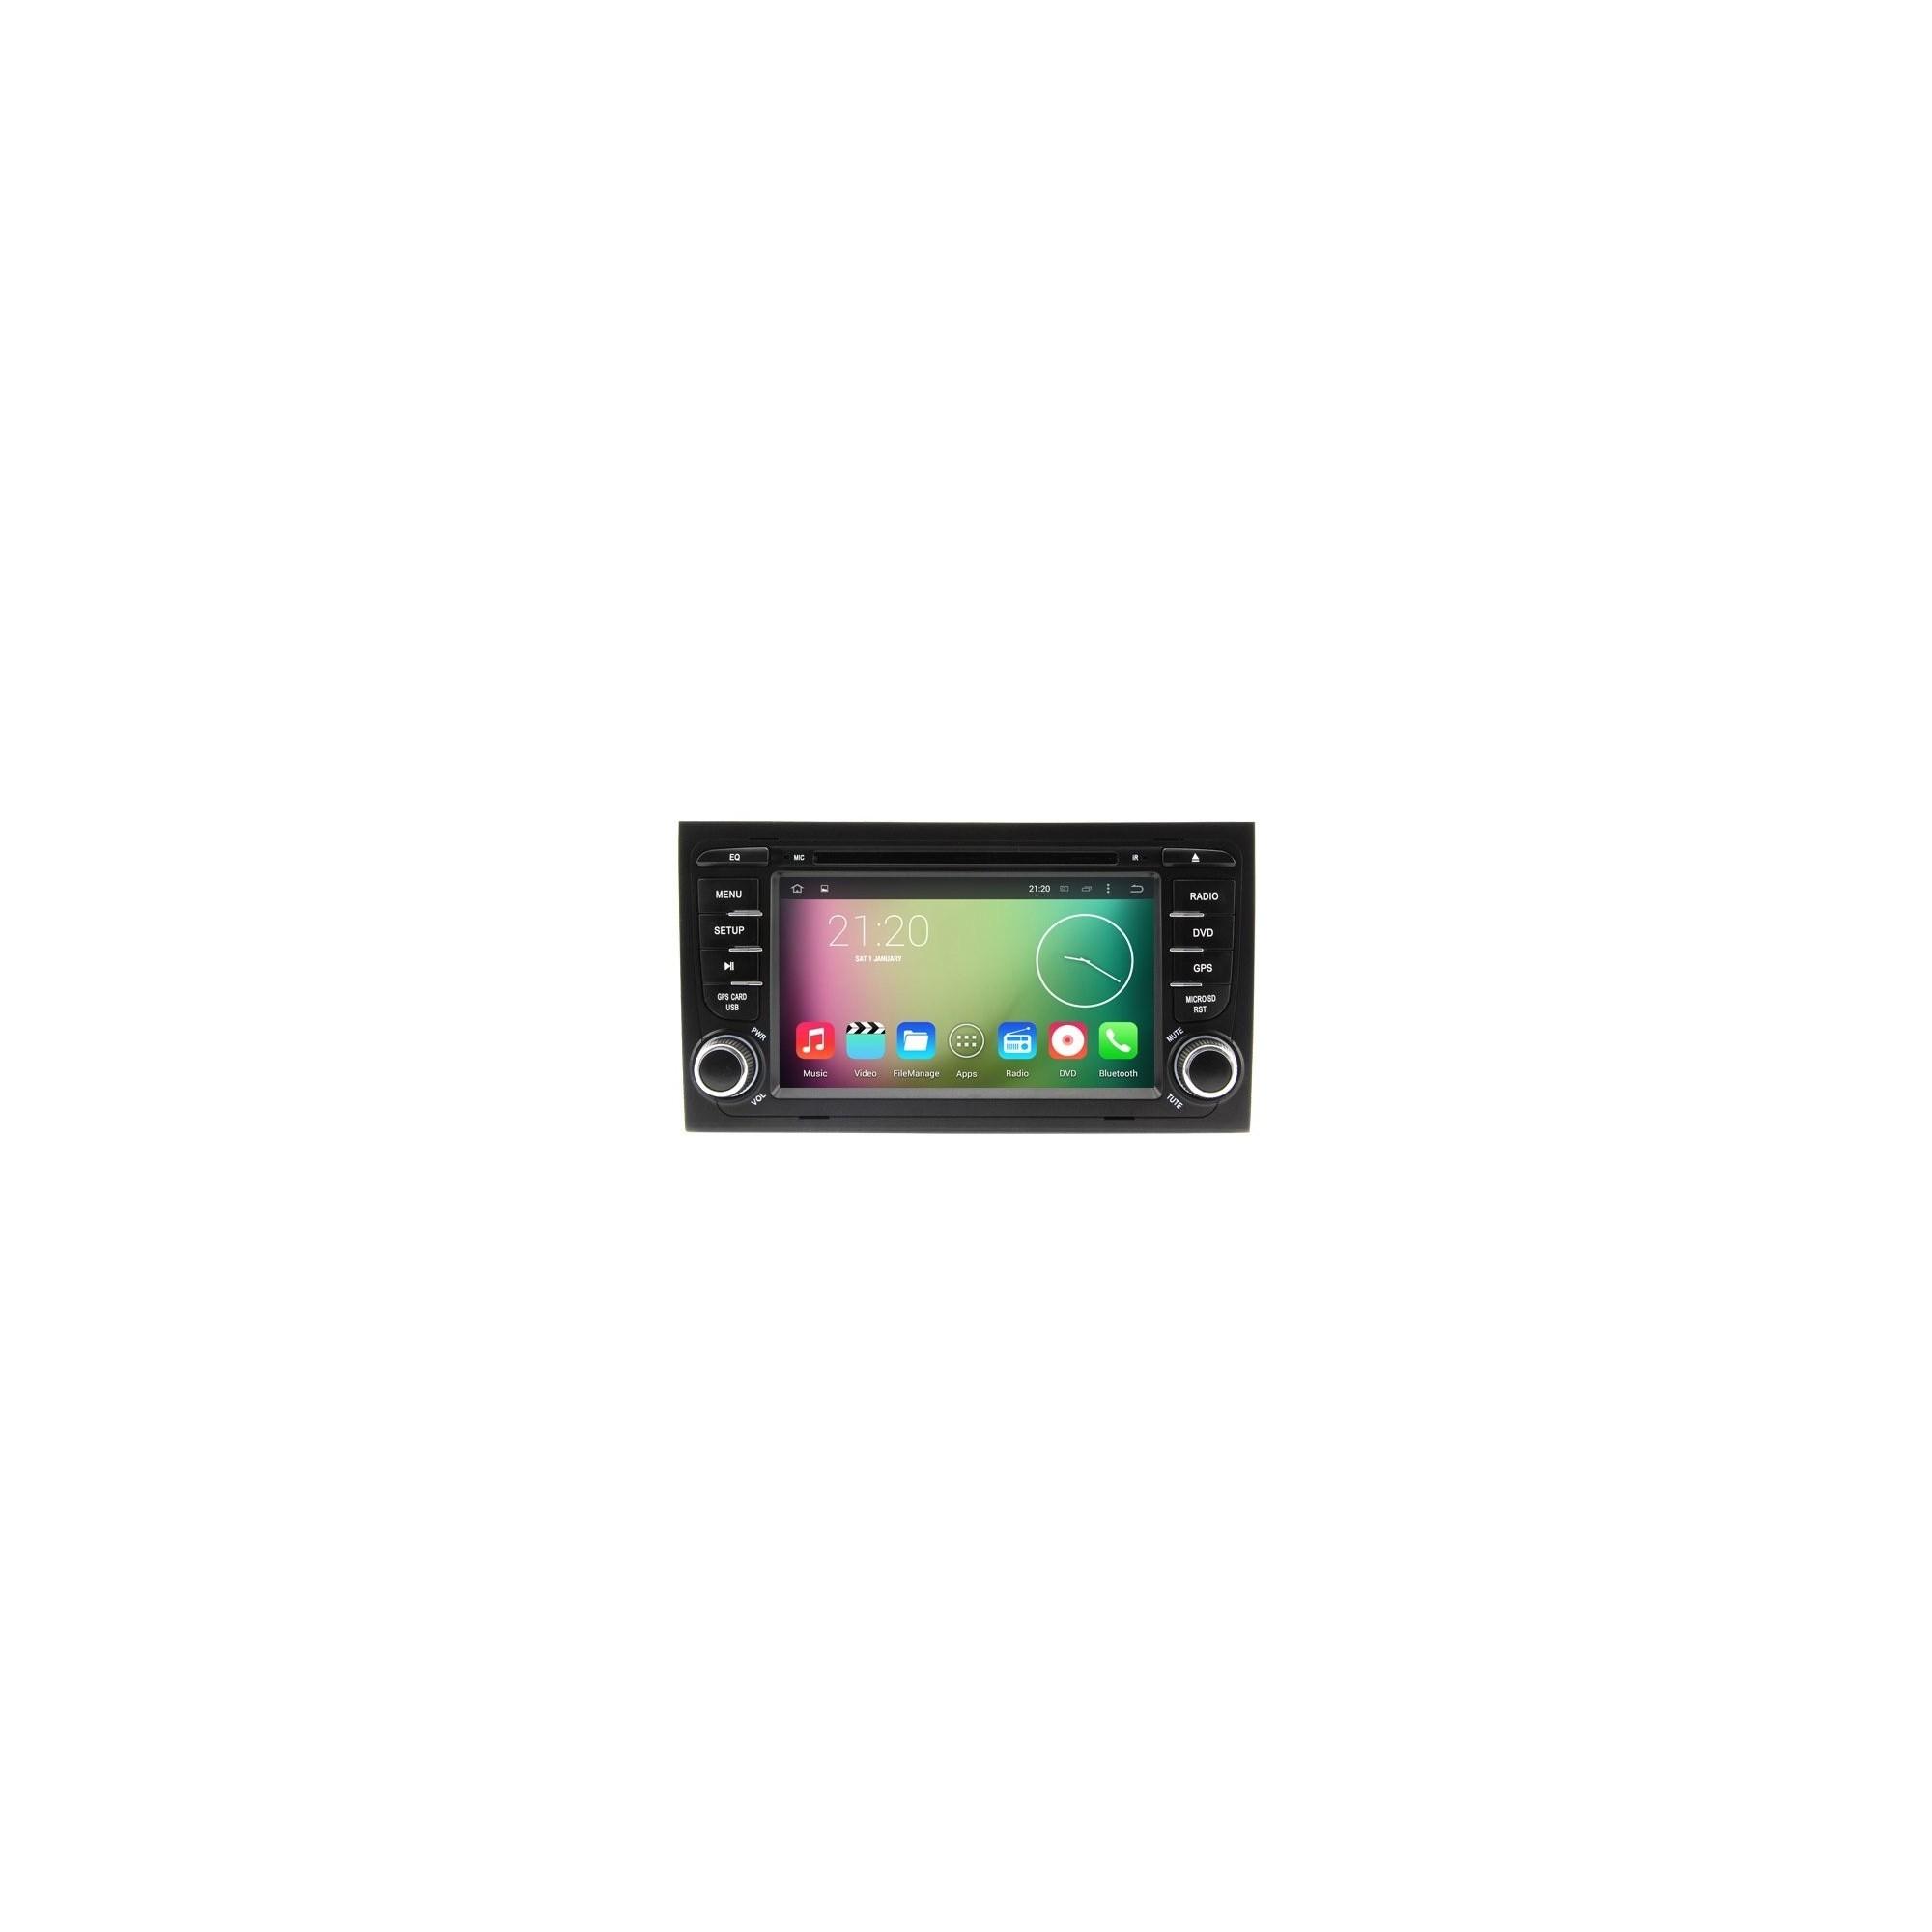 AUTORADIO SPECIFICA AUDI A4 ANDROID QUADCORE WIFI 3G GPS BLUETOOTH USB -  EXPRESSTECH STORE